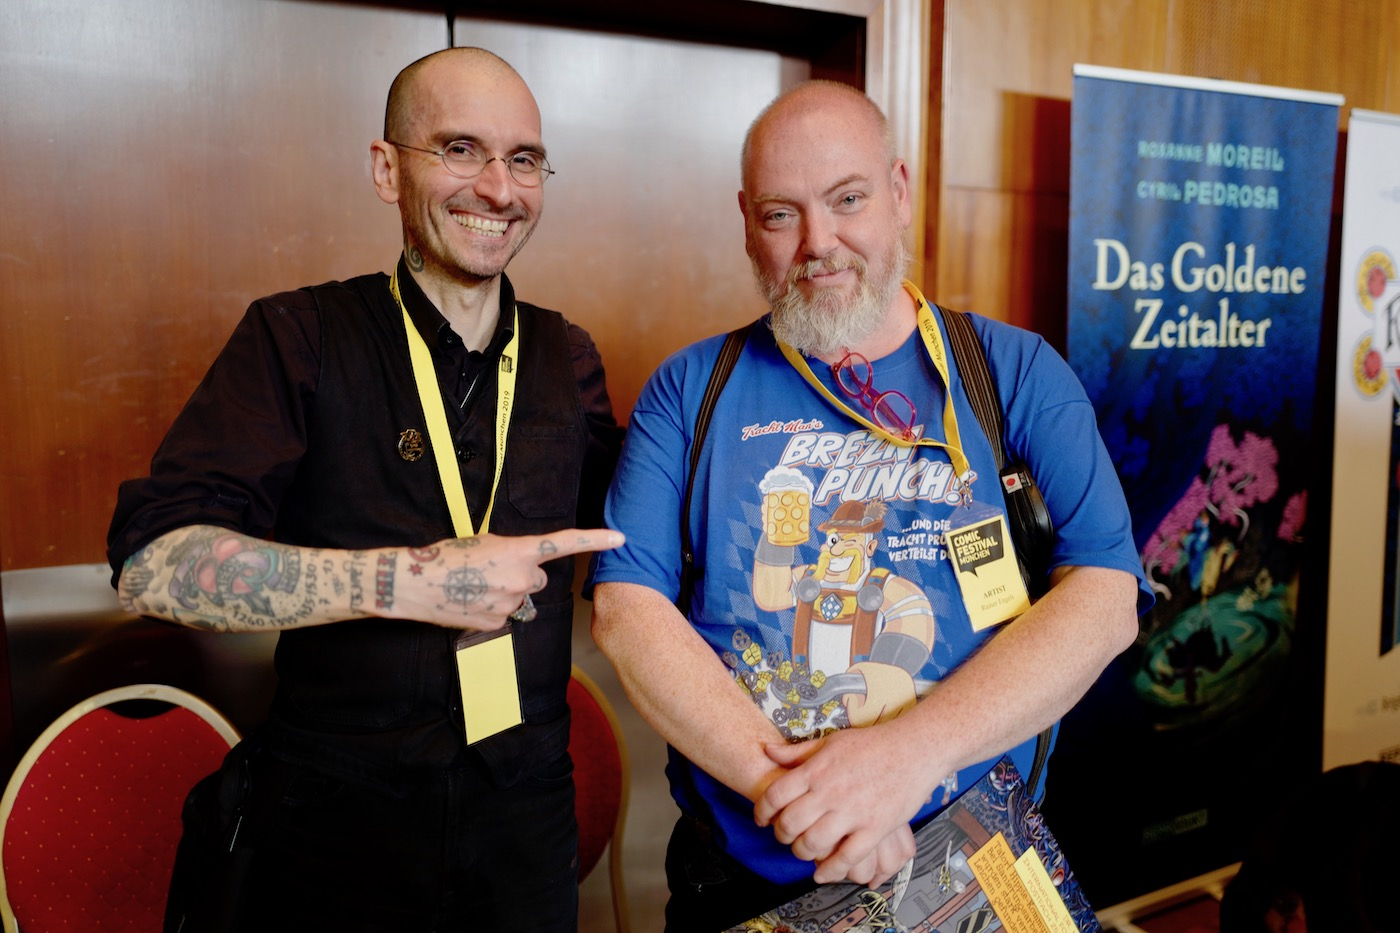 mark_benecke_comic_festival_muenchen_munich_comic_con_2019 - 43.jpg